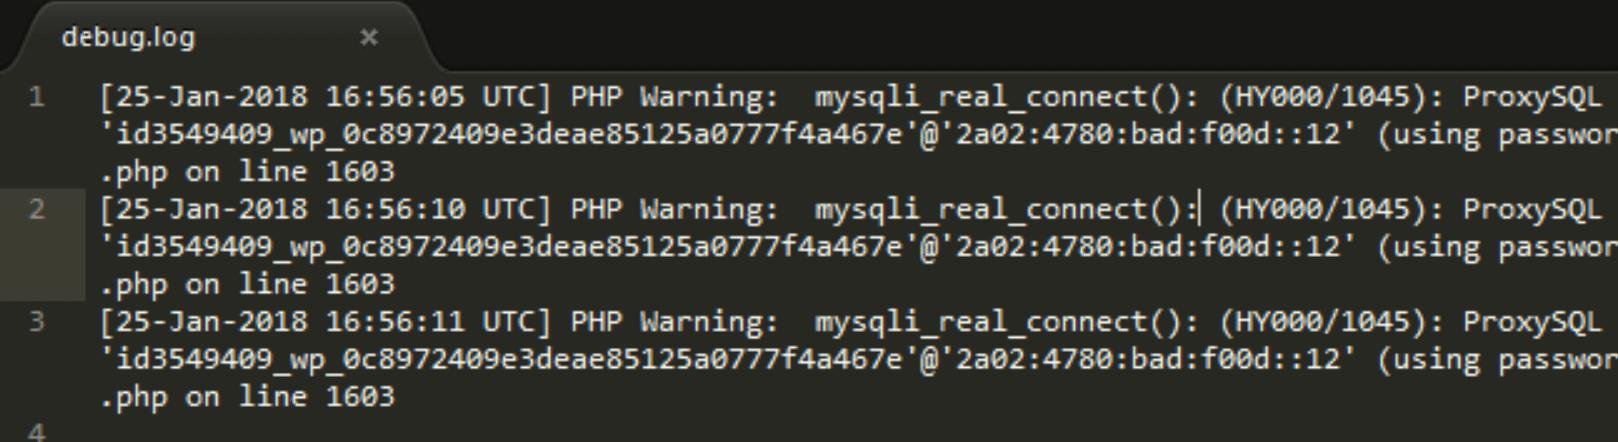 An example of a WordPress error log.